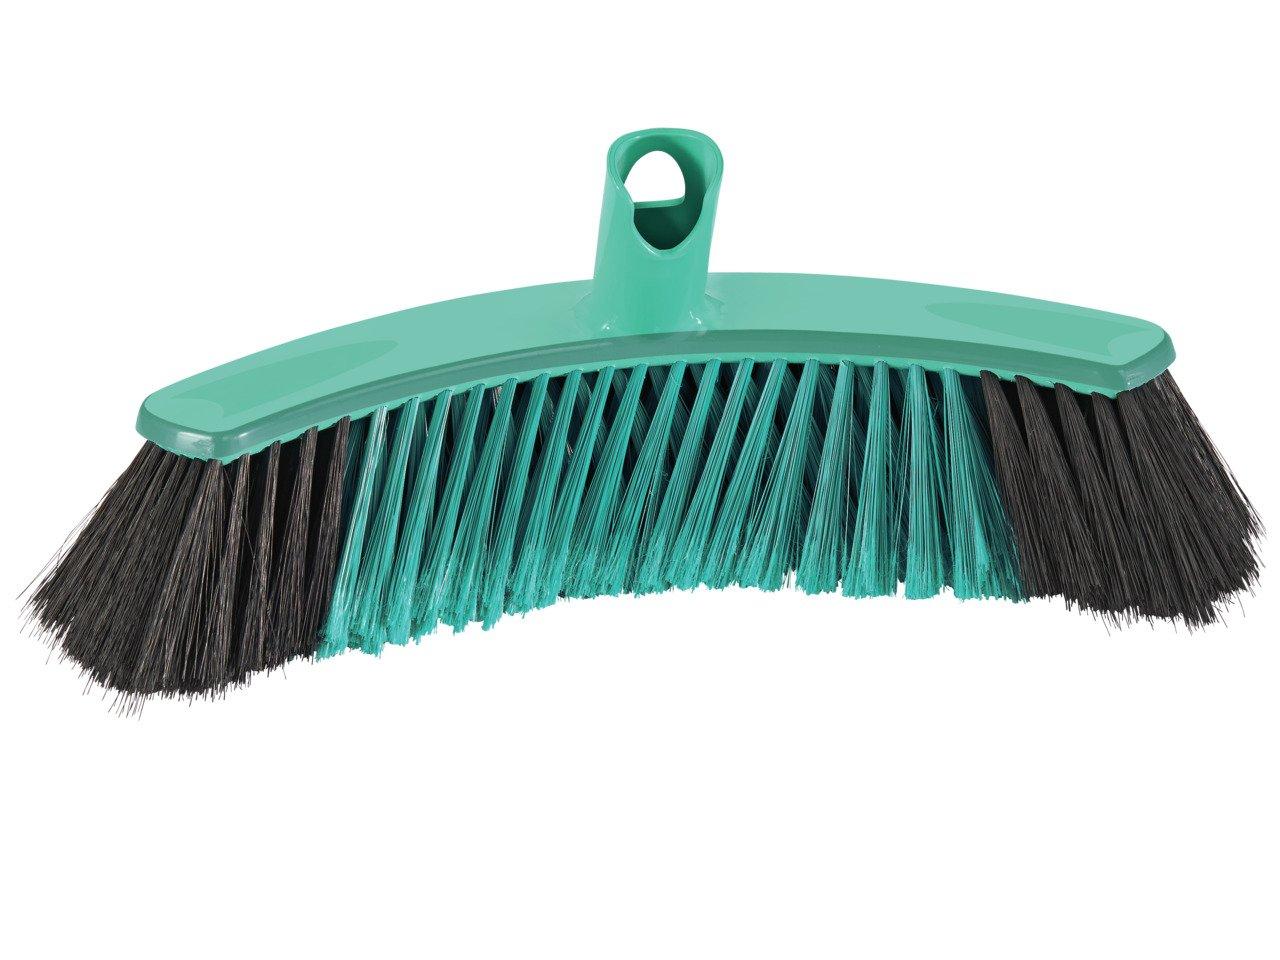 Leifheit Allround Broom Xtra Clean Collect 30 cm, Natural Hair, House Brush, Dustpan Brush, Mint Green, 45030